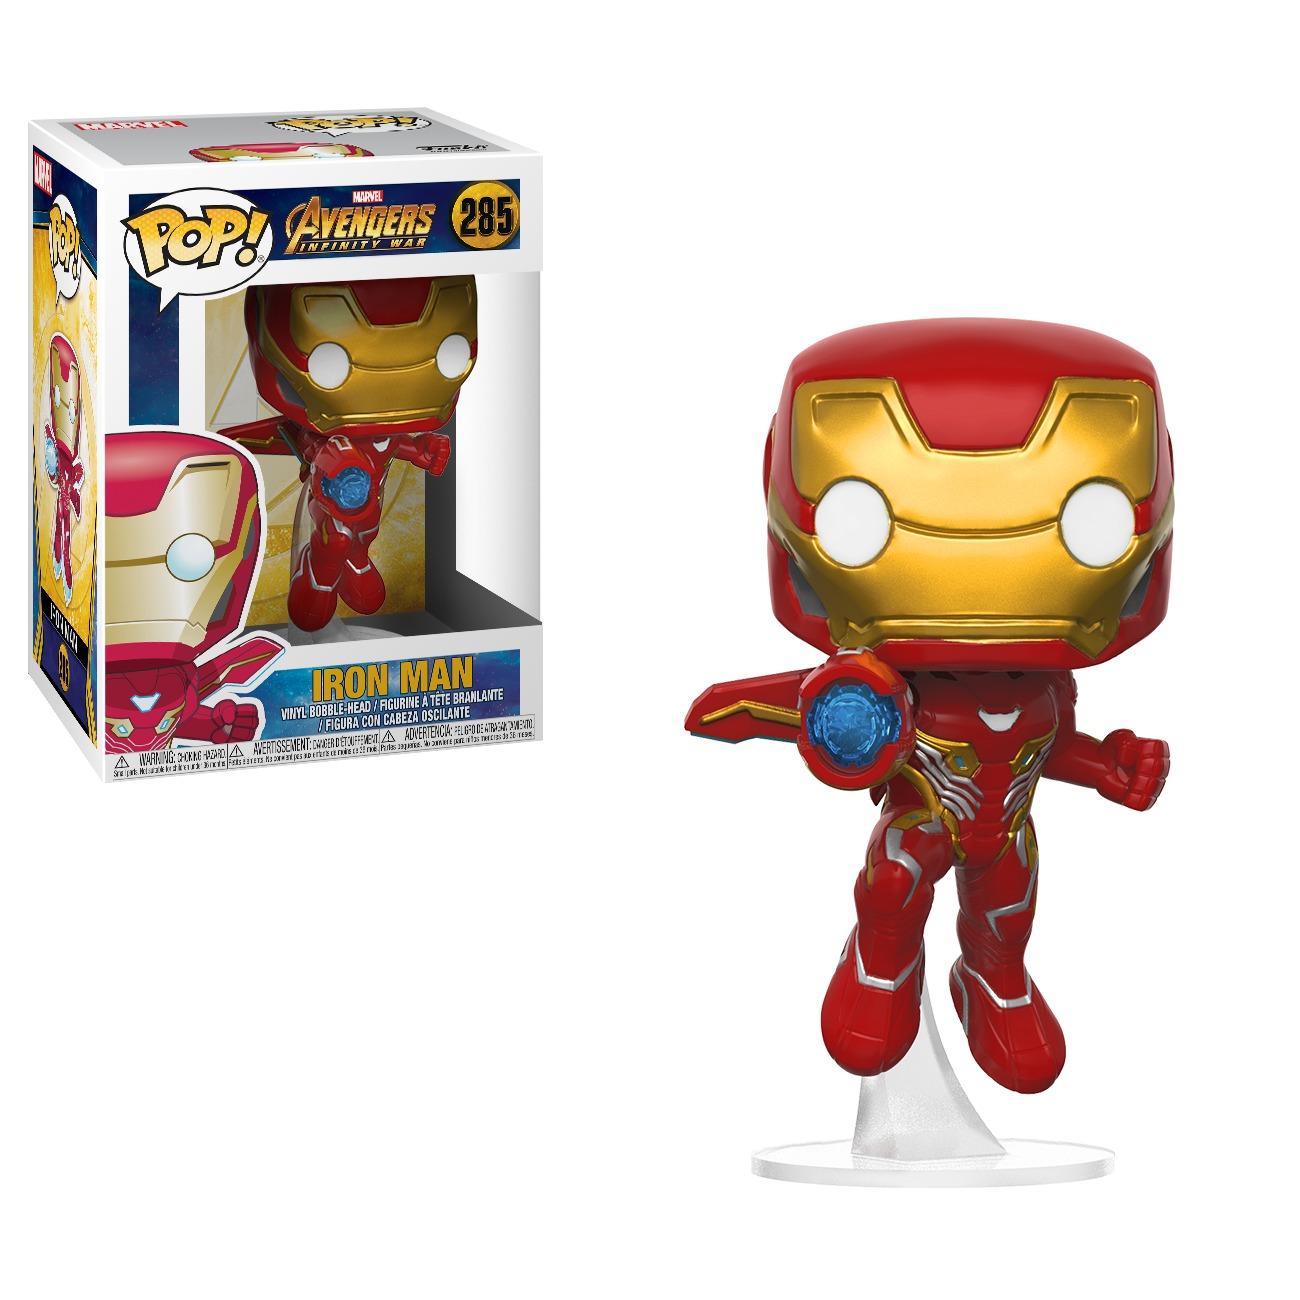 Avengers: Infinity War - Iron Man Pop! Vinyl Figure image